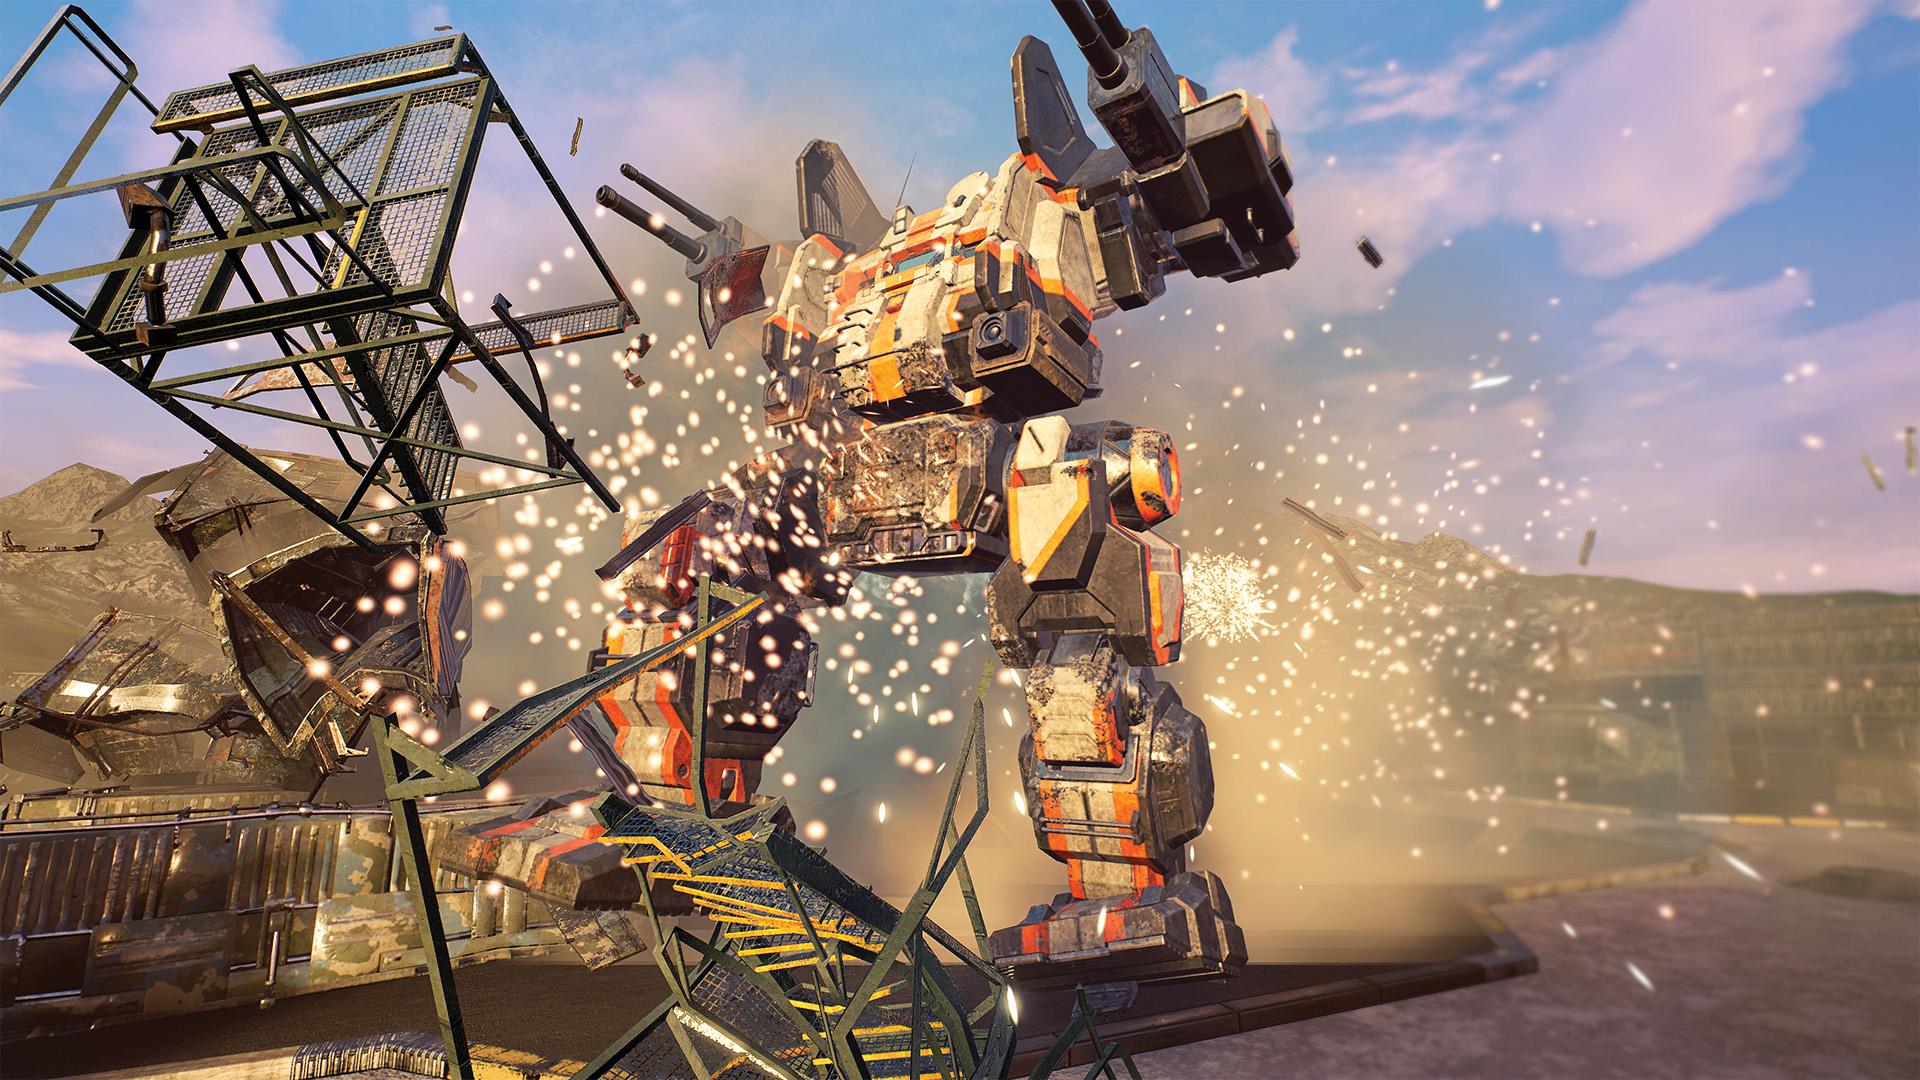 Piranha Games explica por que o MechWarrior 5: Mercenaries foi exclusivo da Epic Store